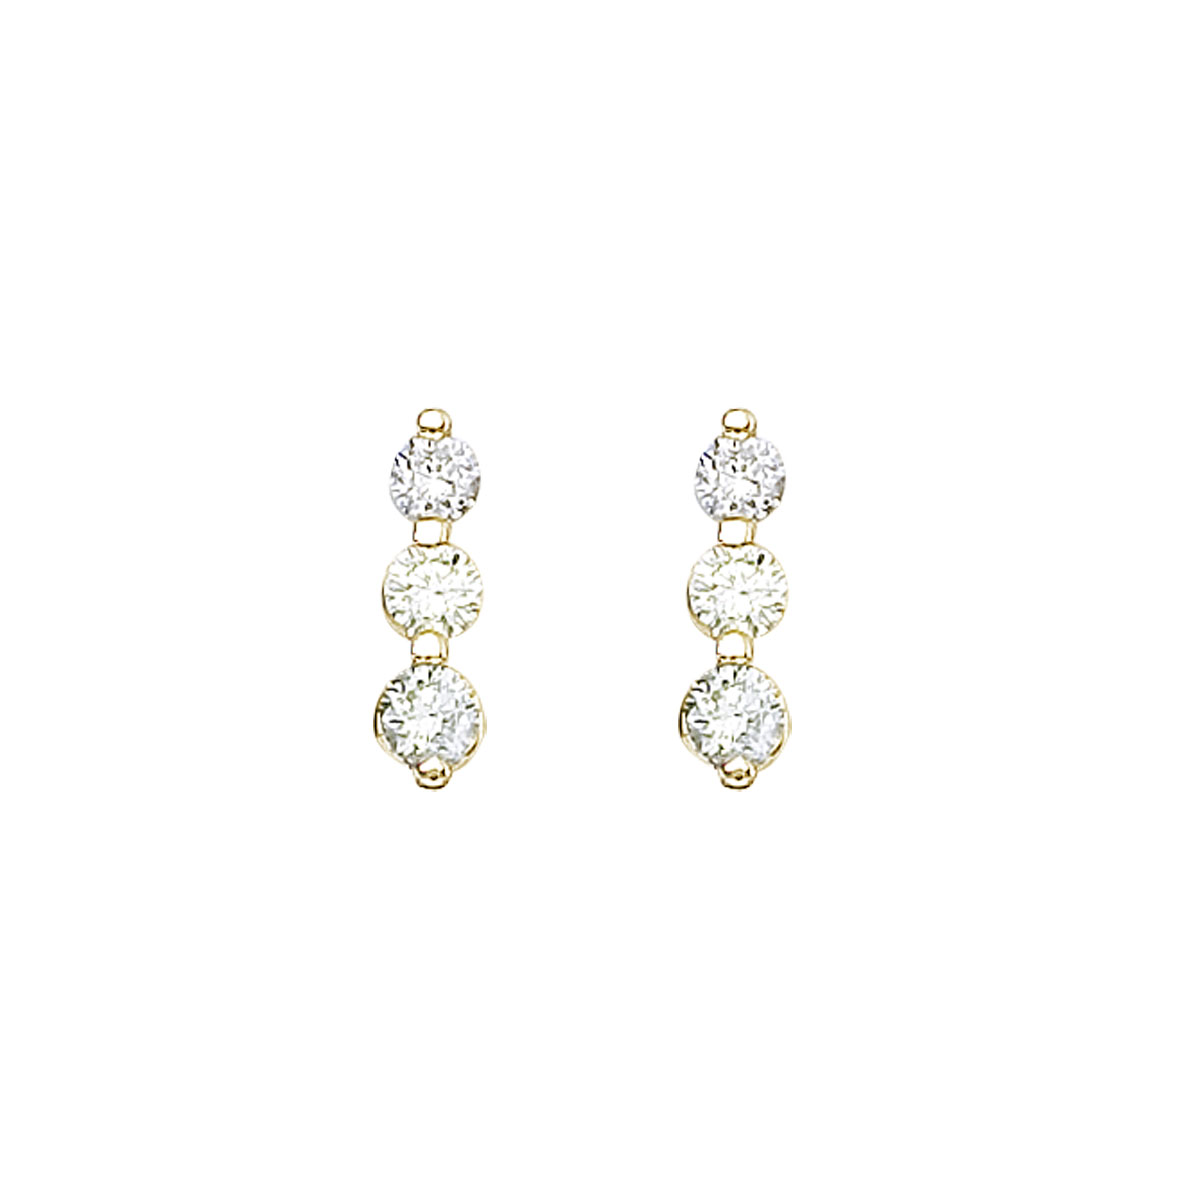 .50 carat three stone diamond earrings set in 14k yellow gold.